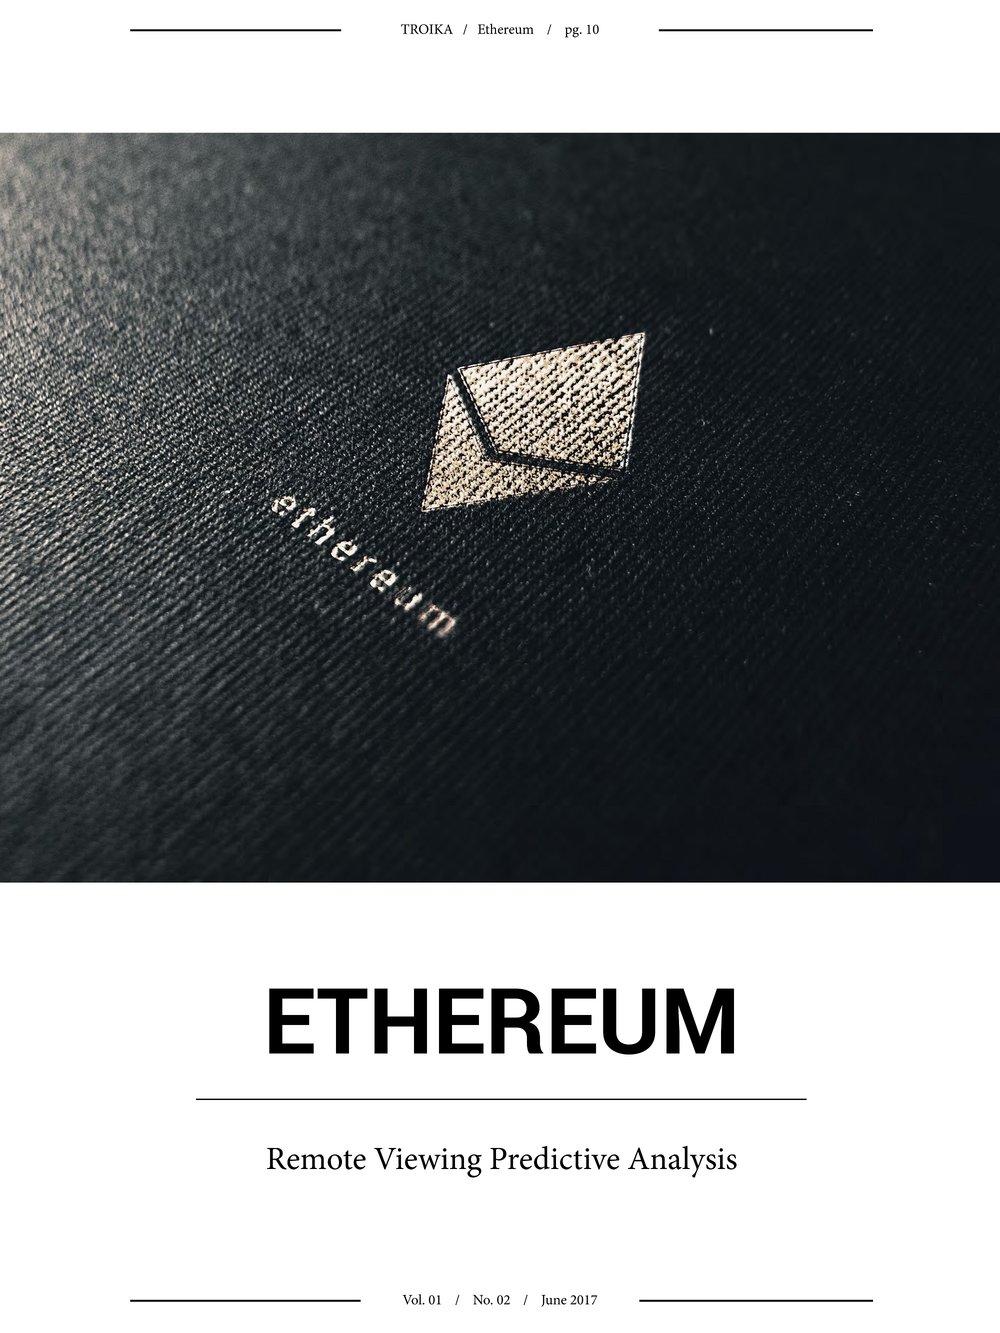 TROIKA-Ethereum-Report-10.jpg